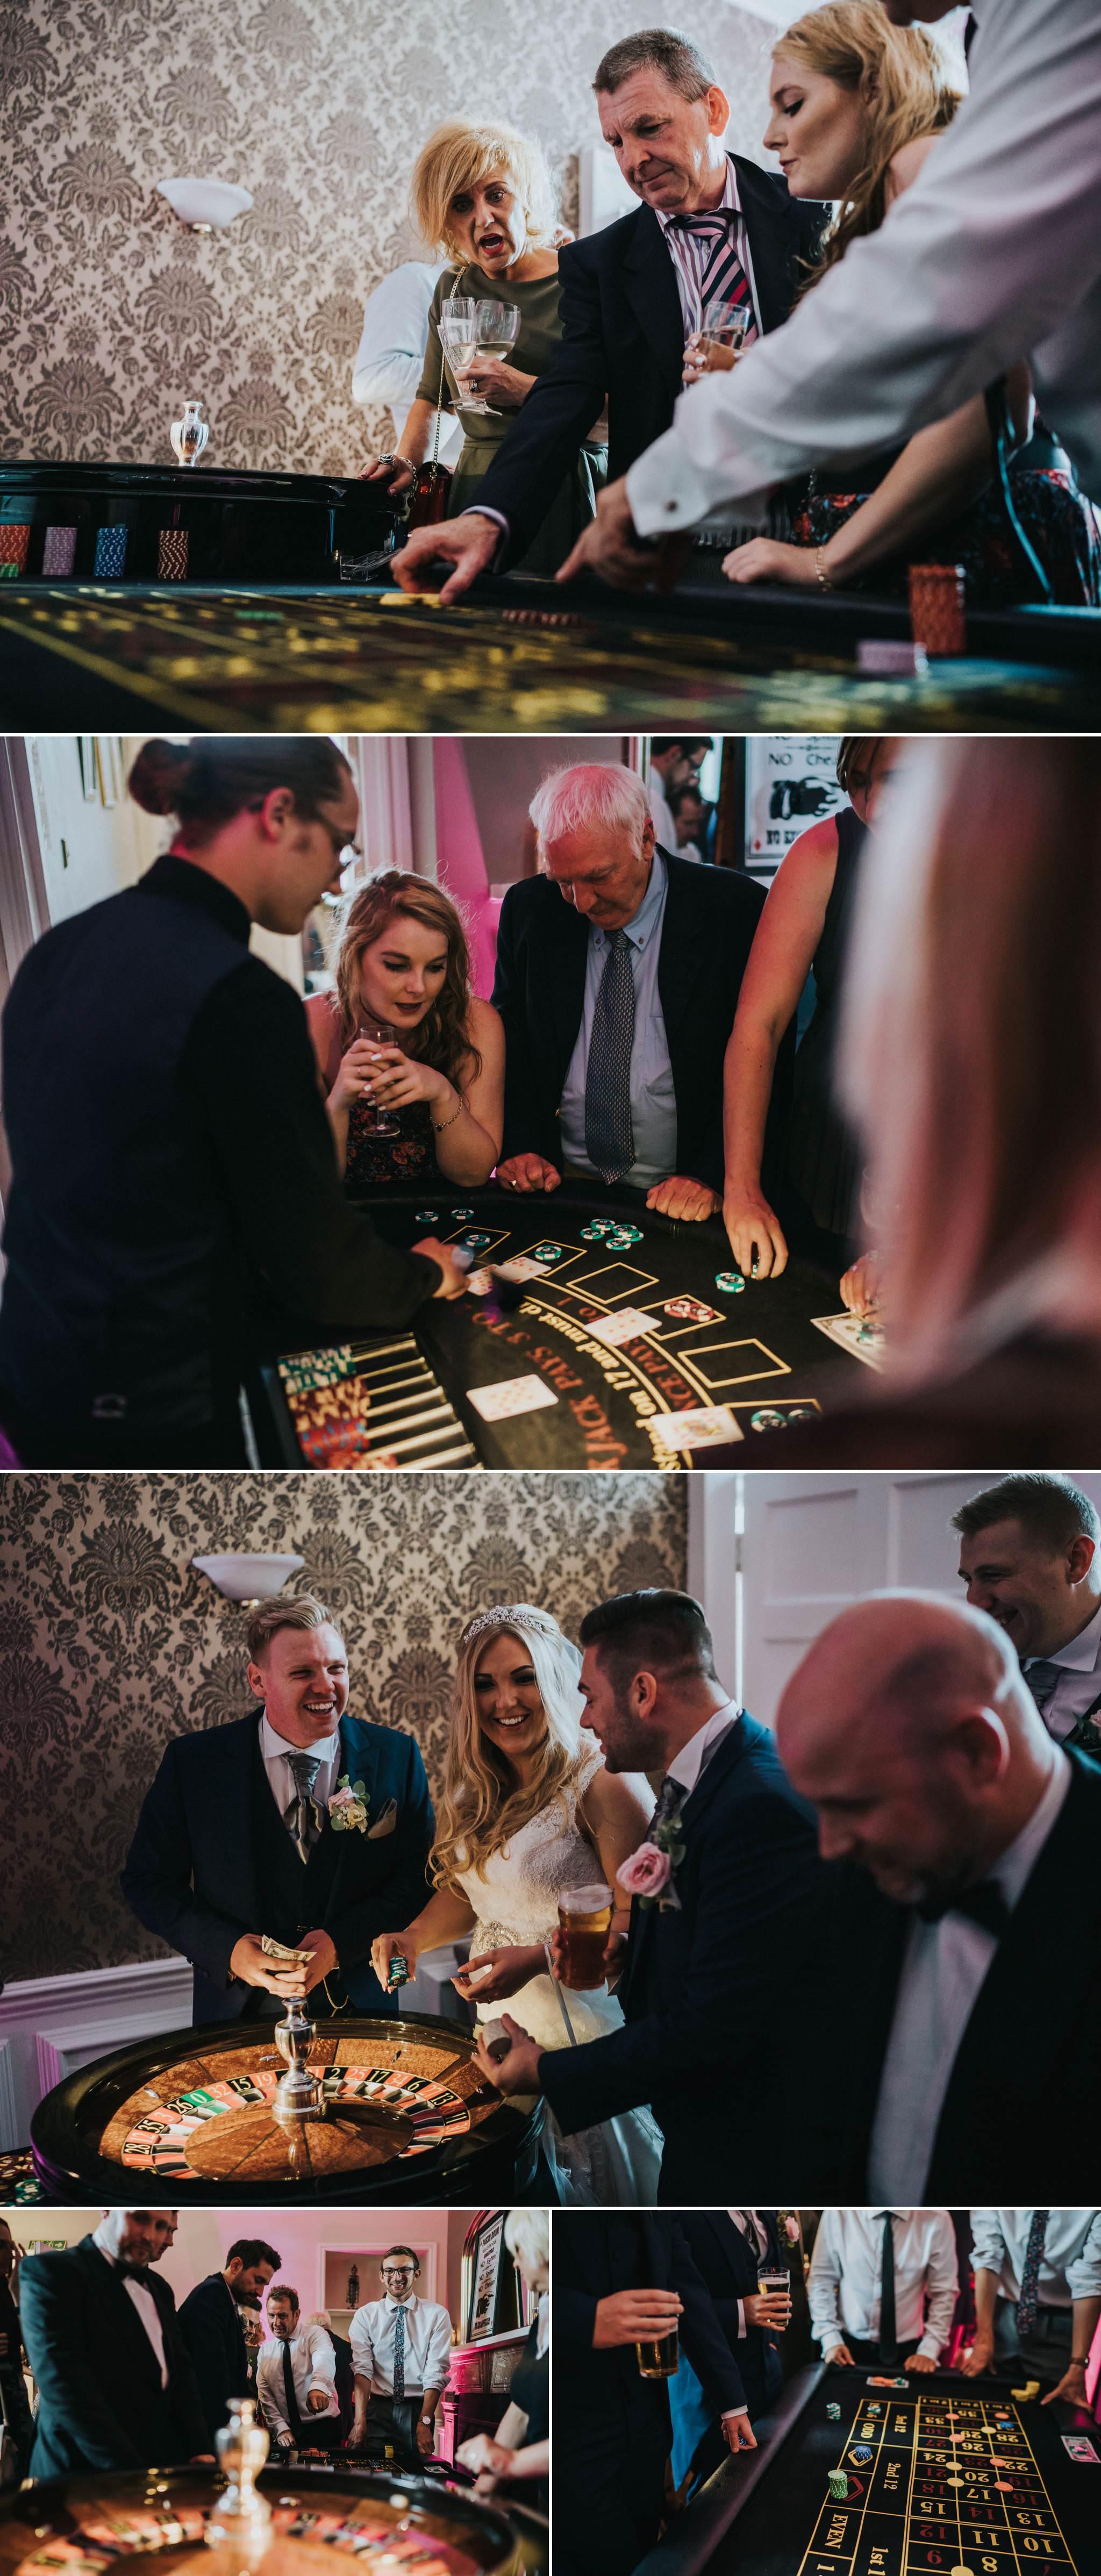 somerford-hall-wedding-photography 17.jpg